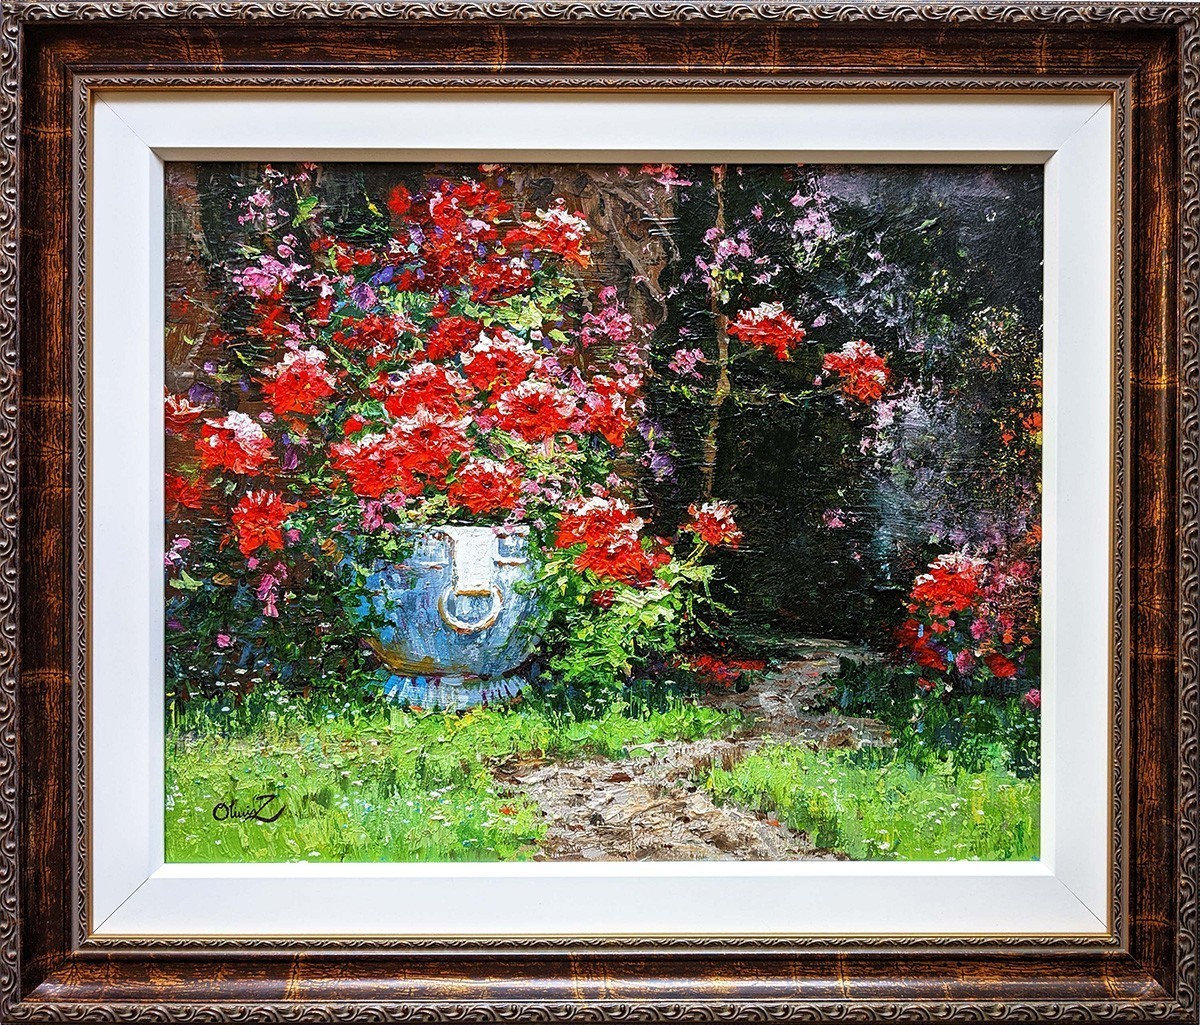 Scarlet Flowers -16x20 - Original Oil - Olivia Zeng